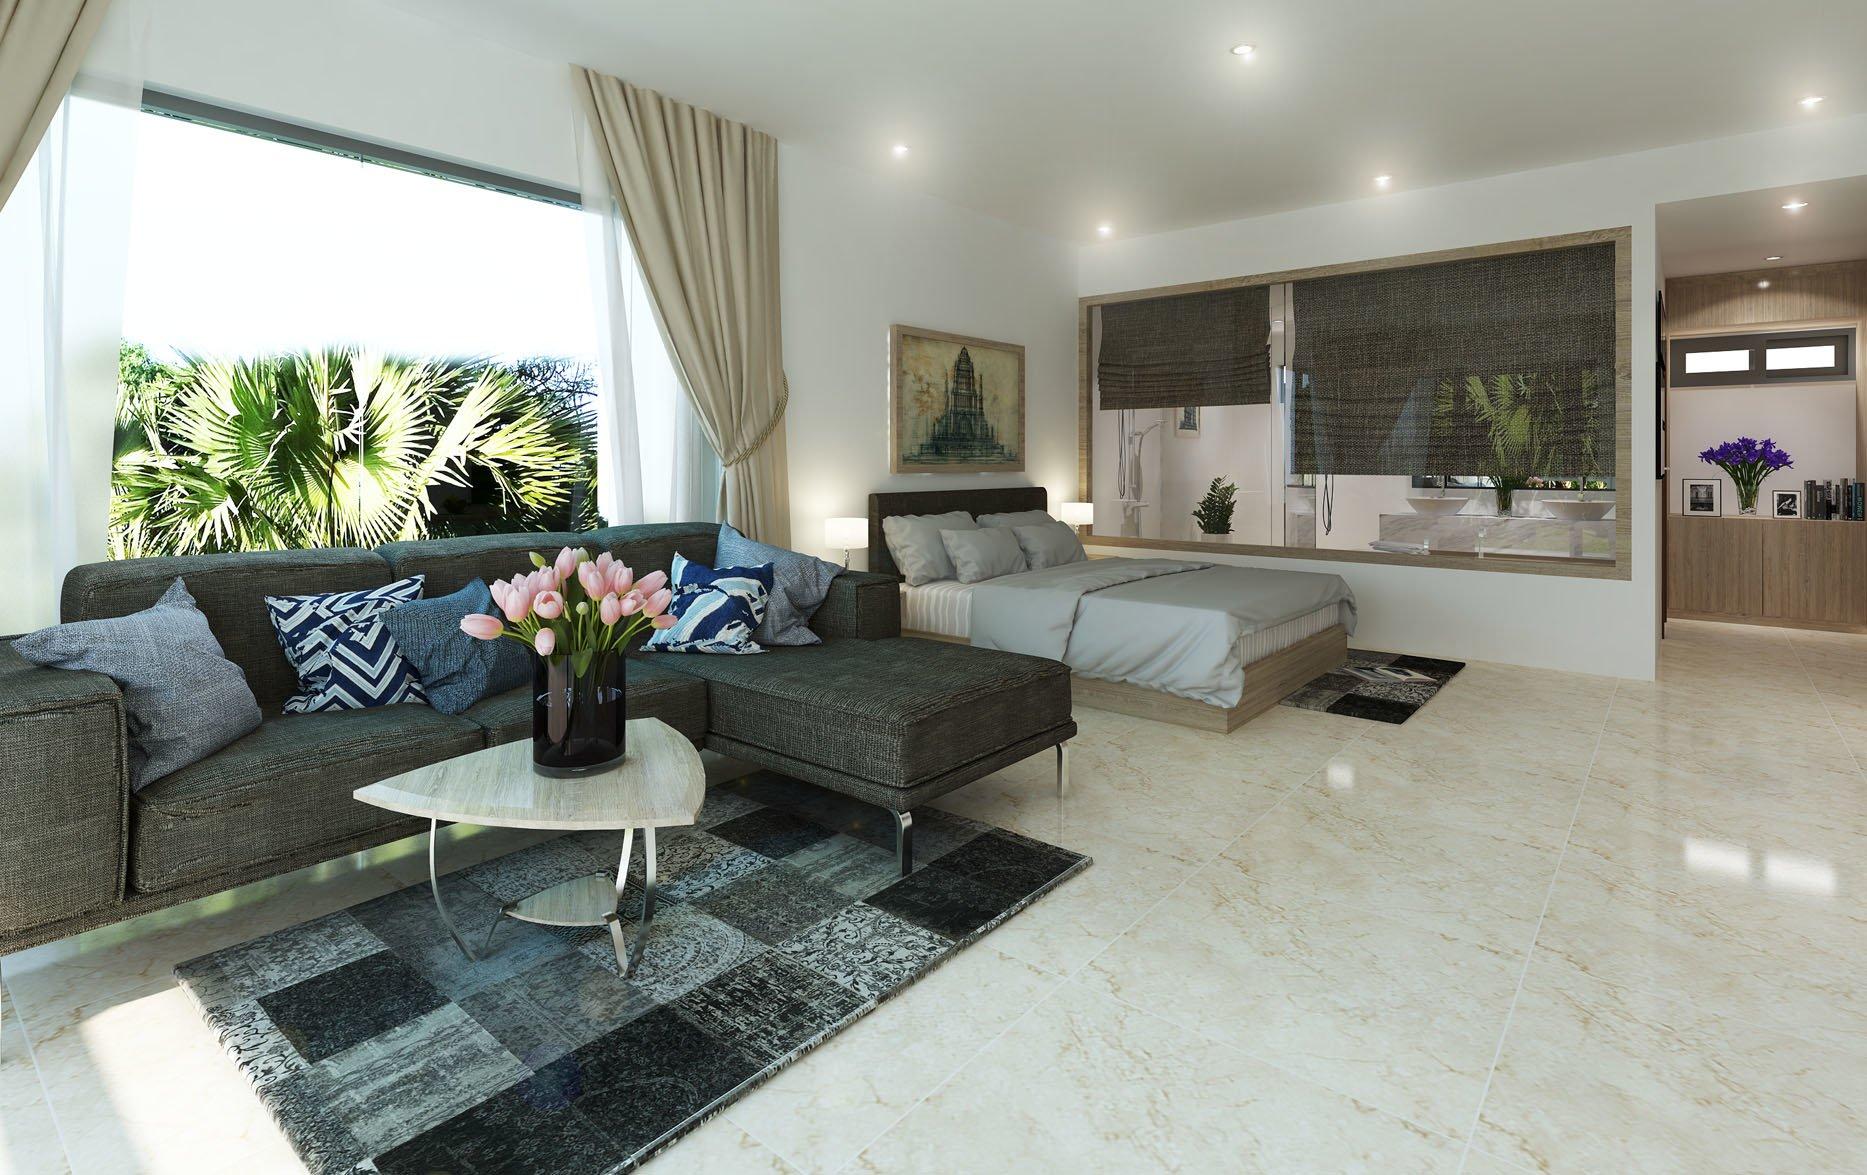 can ho Sunshine Diamond Bay Nha Trang - Sunshine Diamond Bay Nha Trang và 5 kiểu căn hộ đáng sống